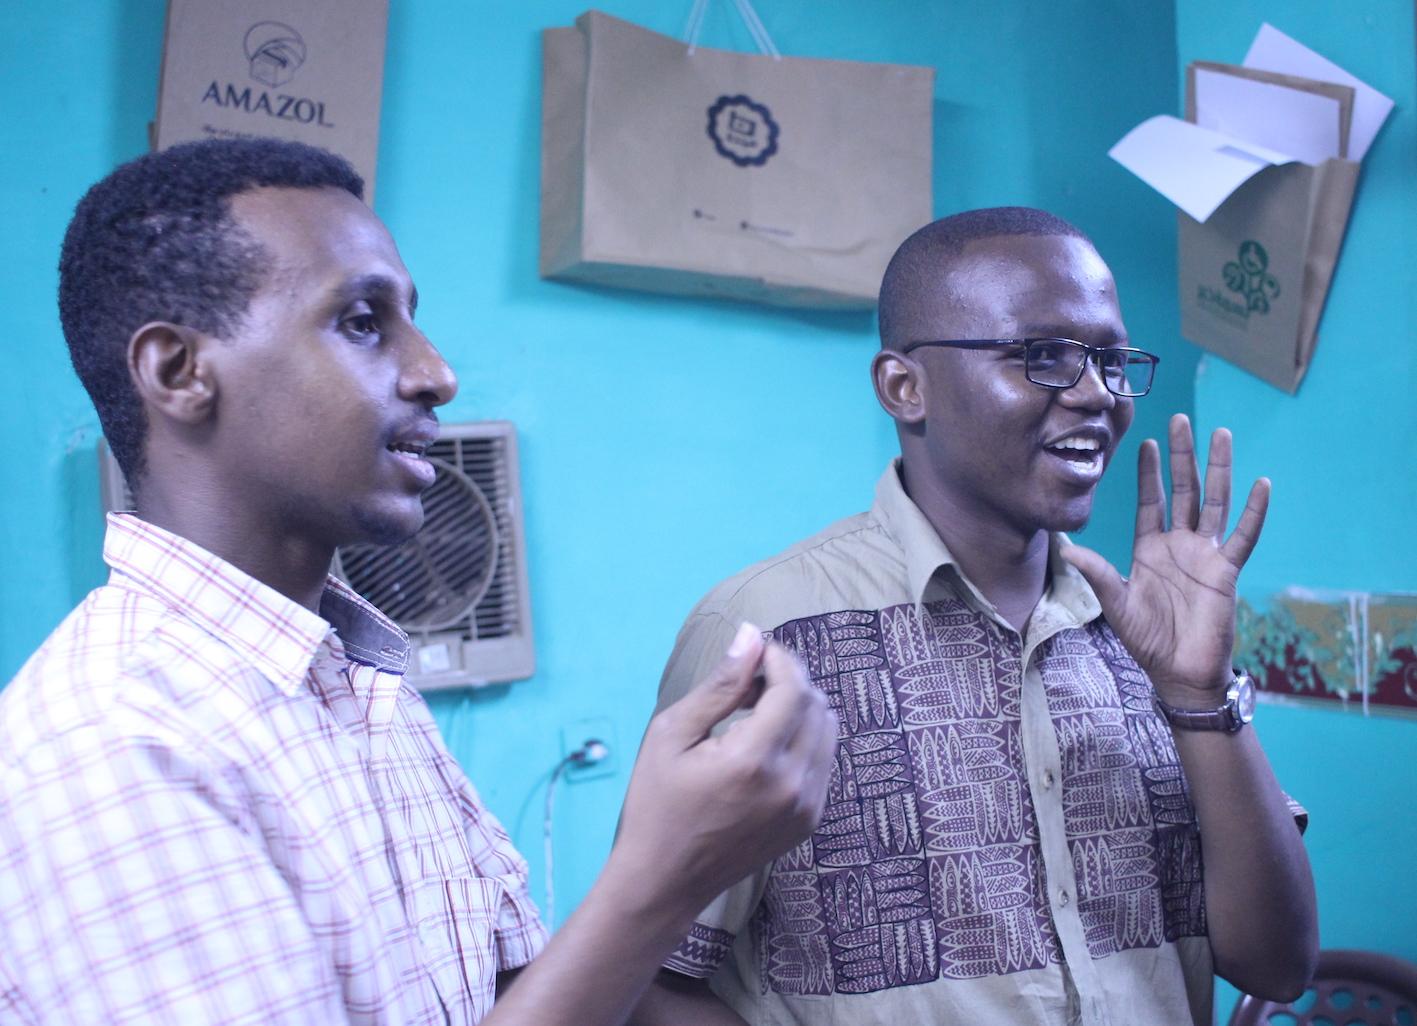 Fanda Pack Sudan founders